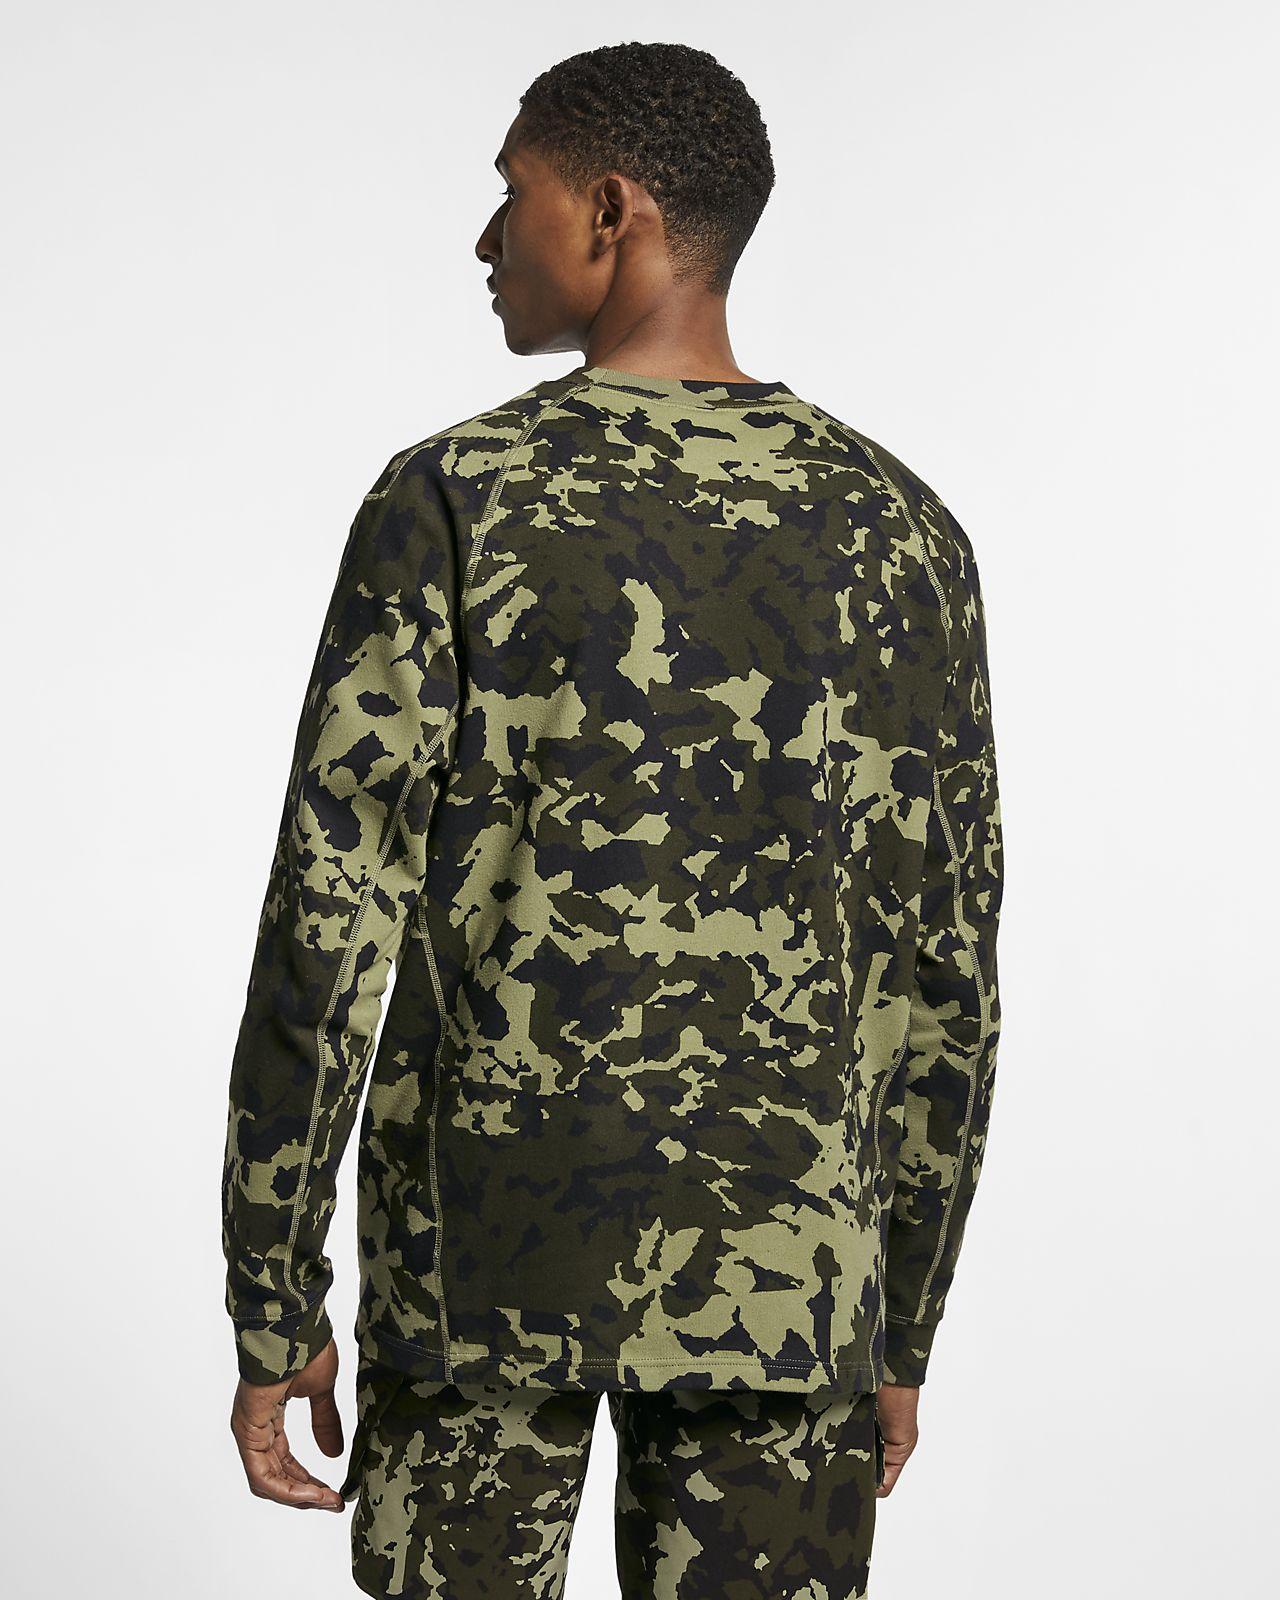 Nike x MMW Men's Printed Long Sleeve Top